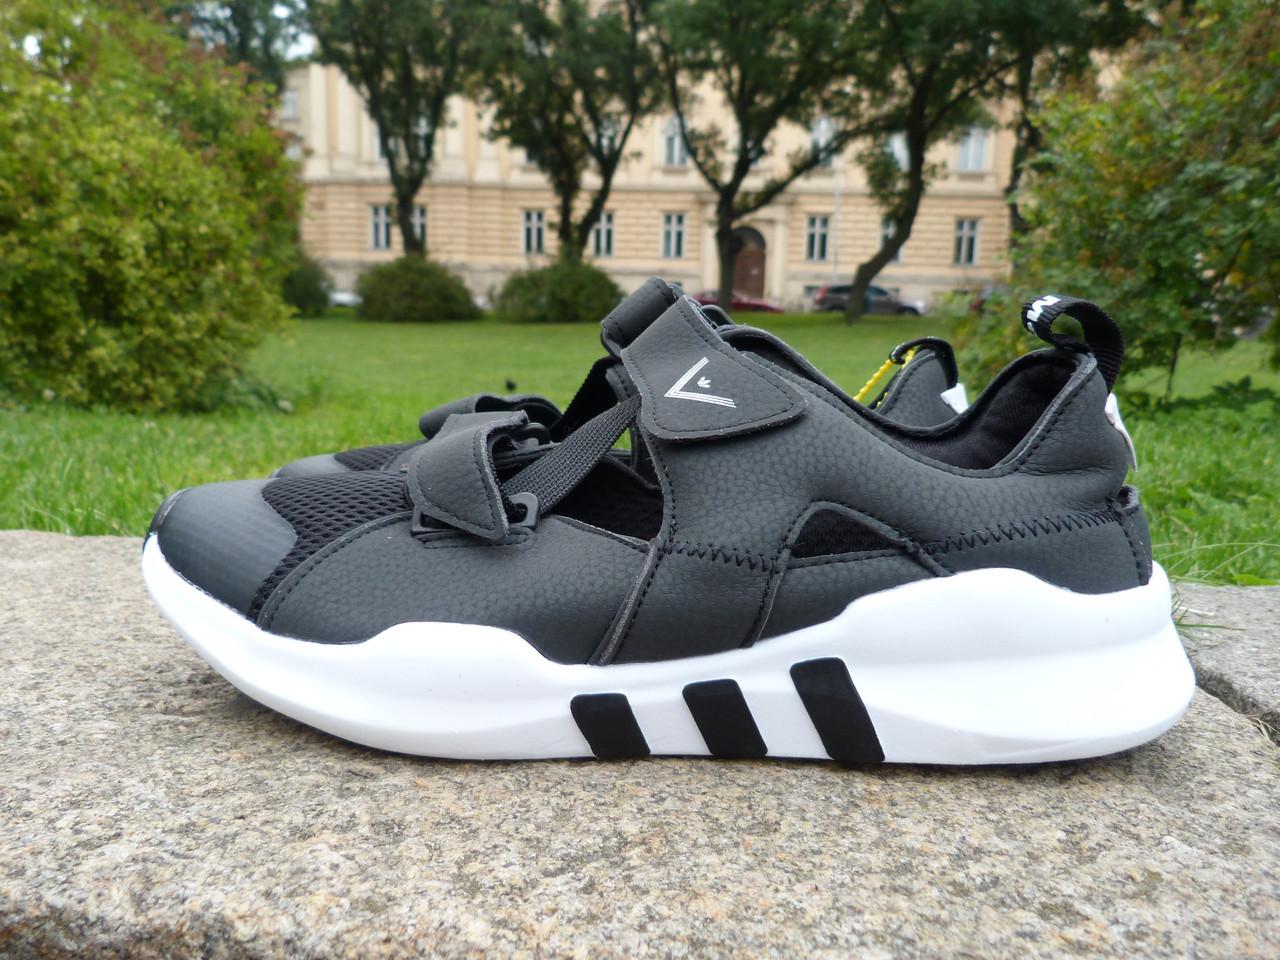 d6339041bfb2 Мужские летние кроссовки - сандали Adidas White Mountaineering ADV Sandal